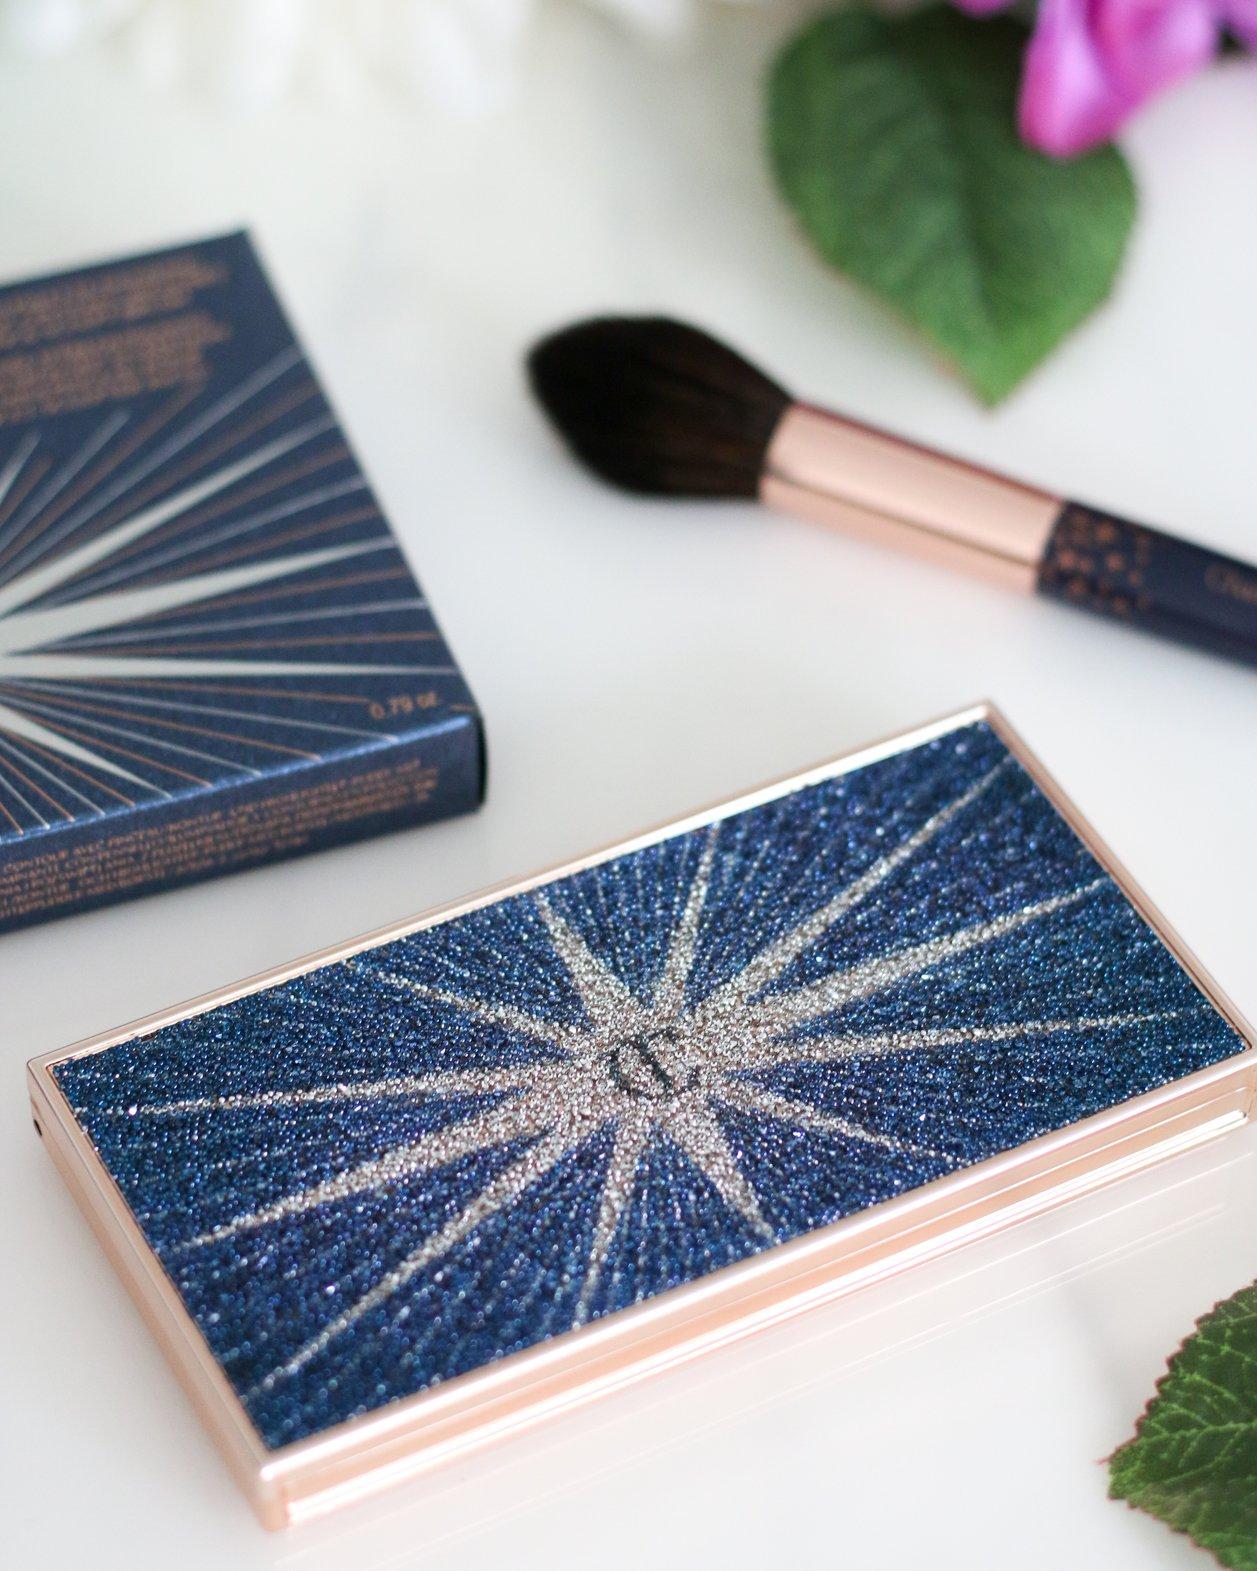 Charlotte Tilbury Bronze & Glow Swarovski Crystals Review